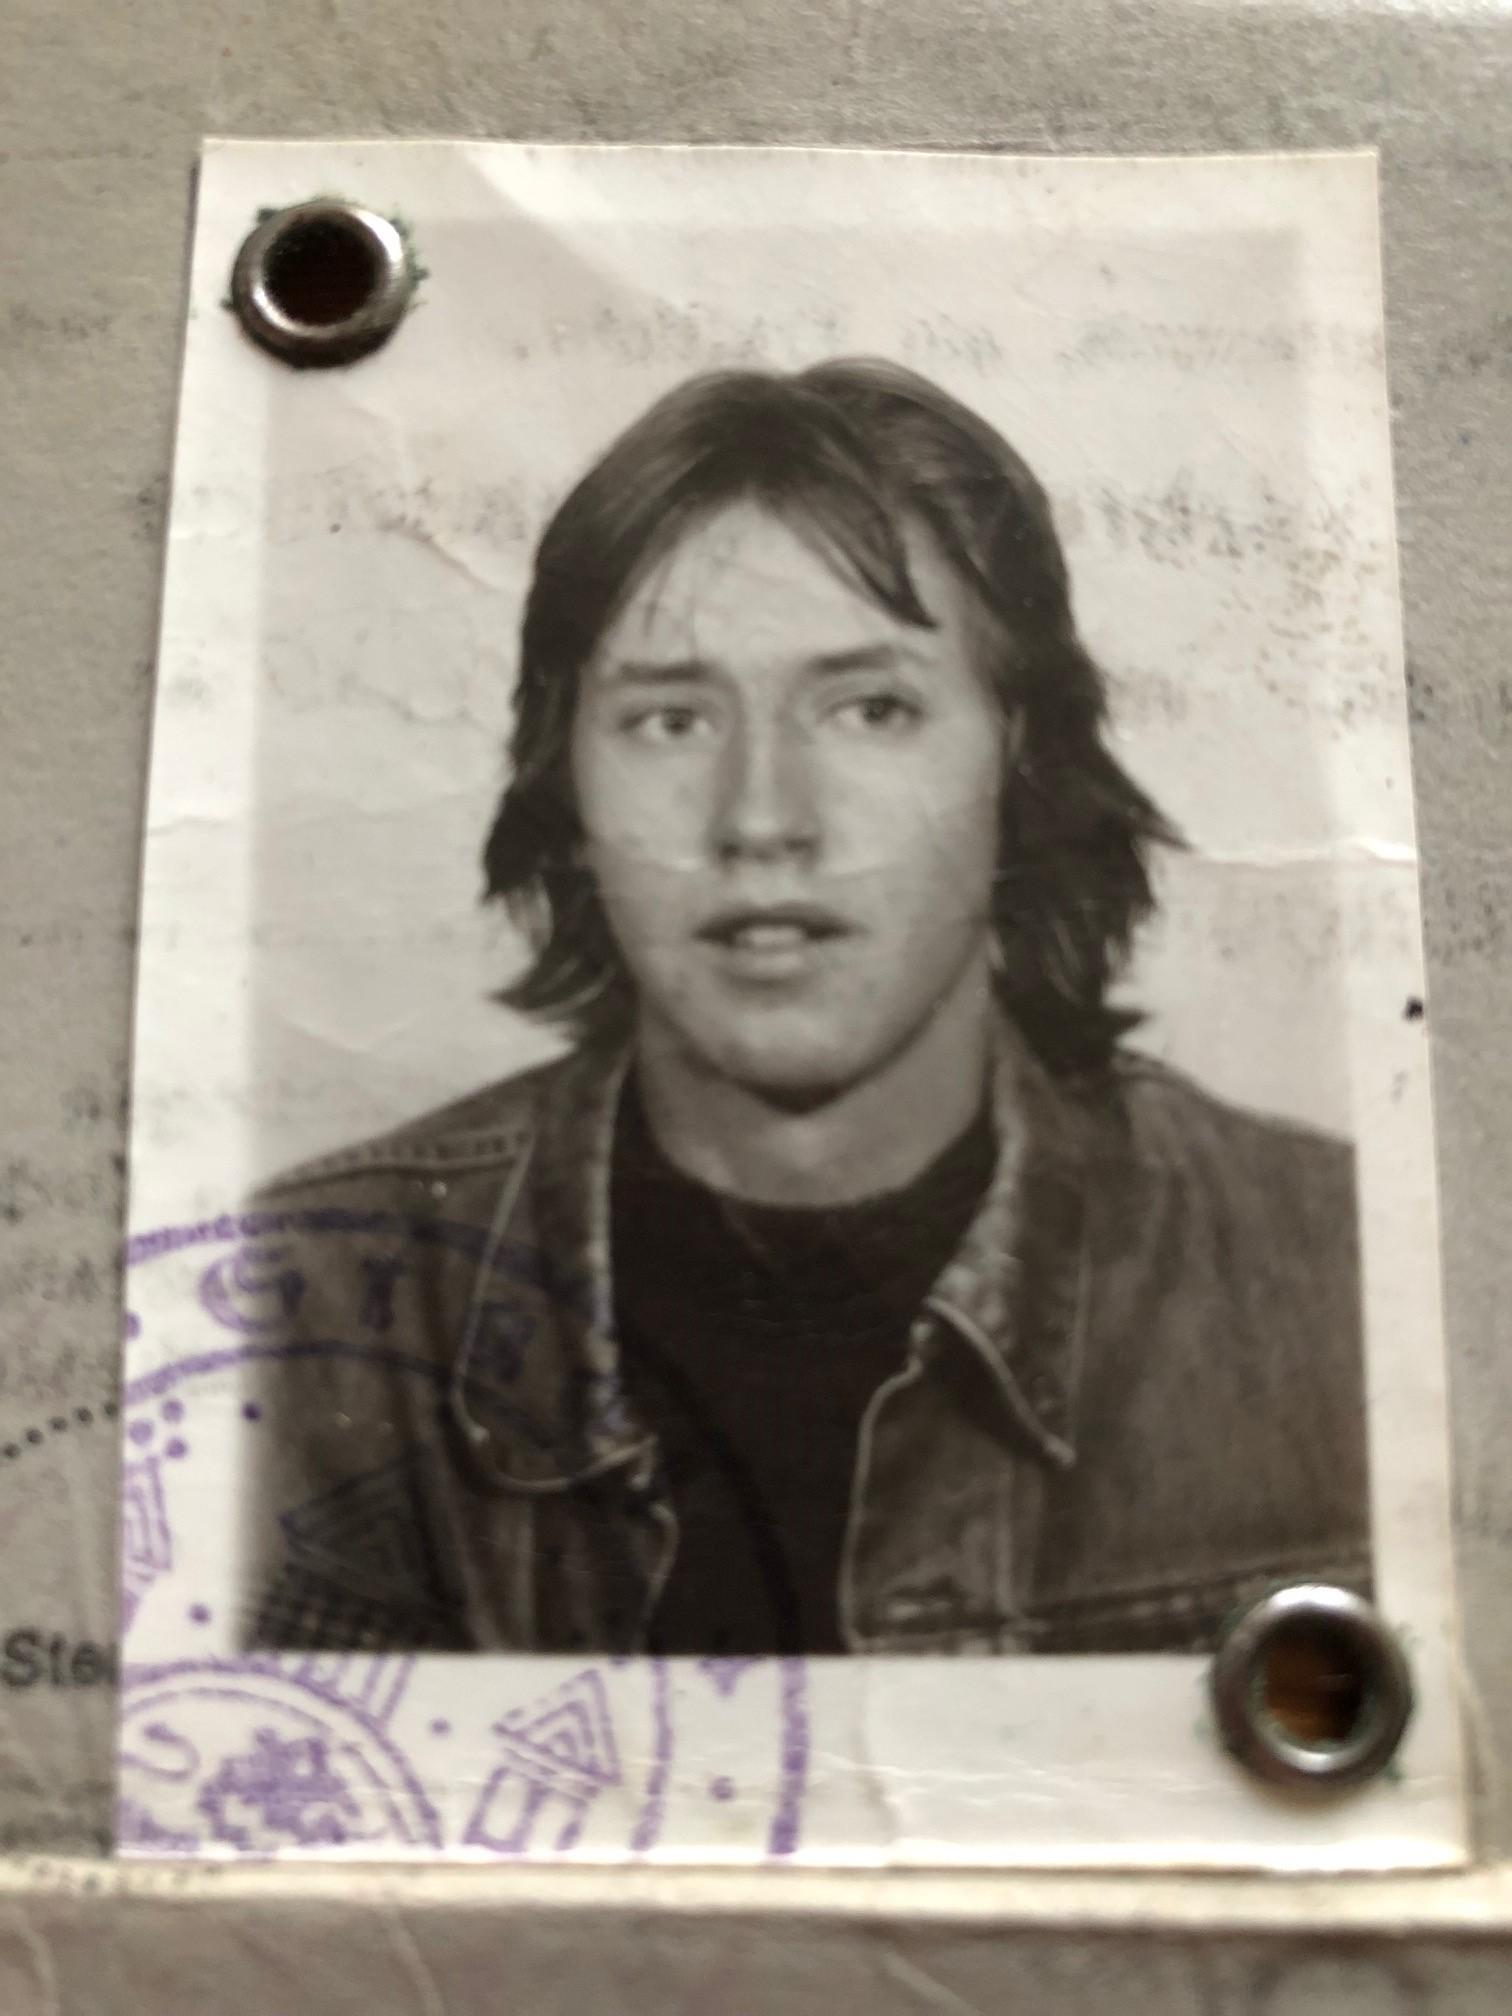 Lou Richter Personalausweis